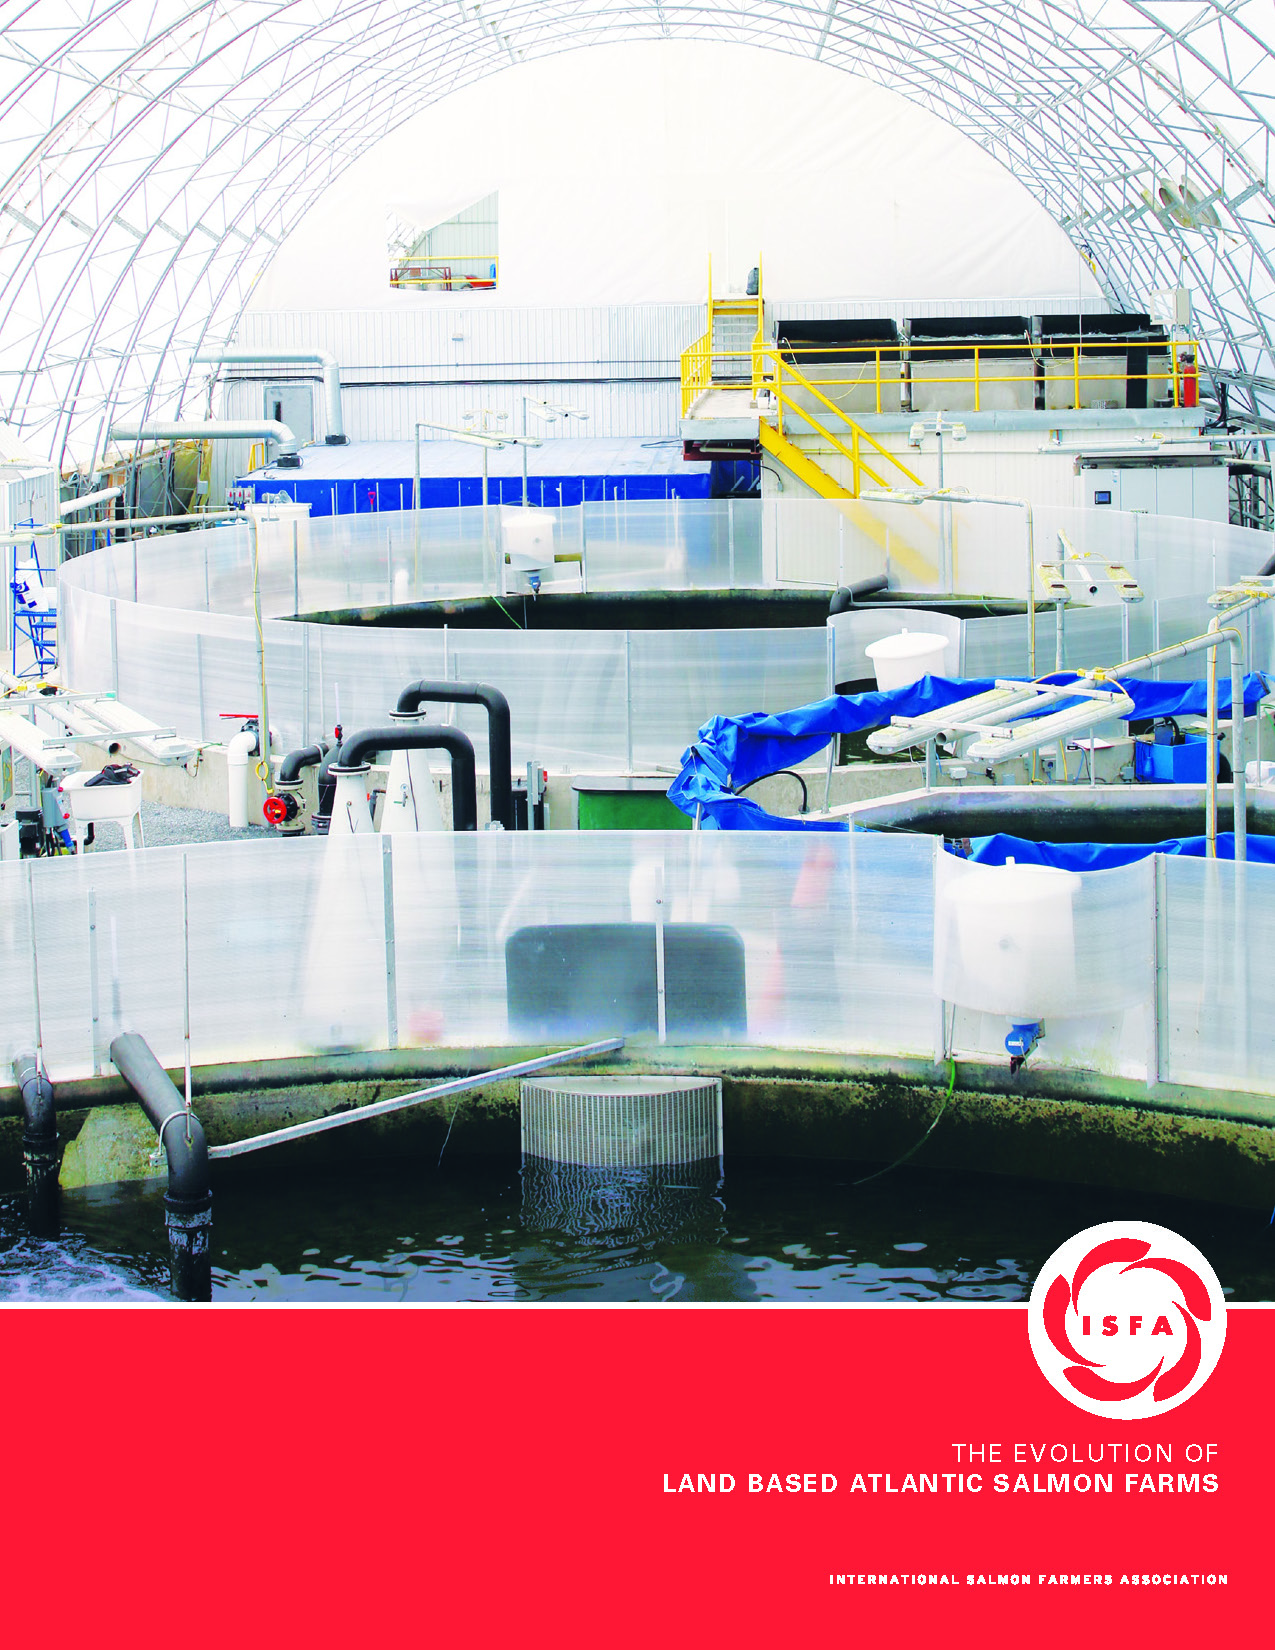 The Evolution of Land Based Atlantic Salmon Farms